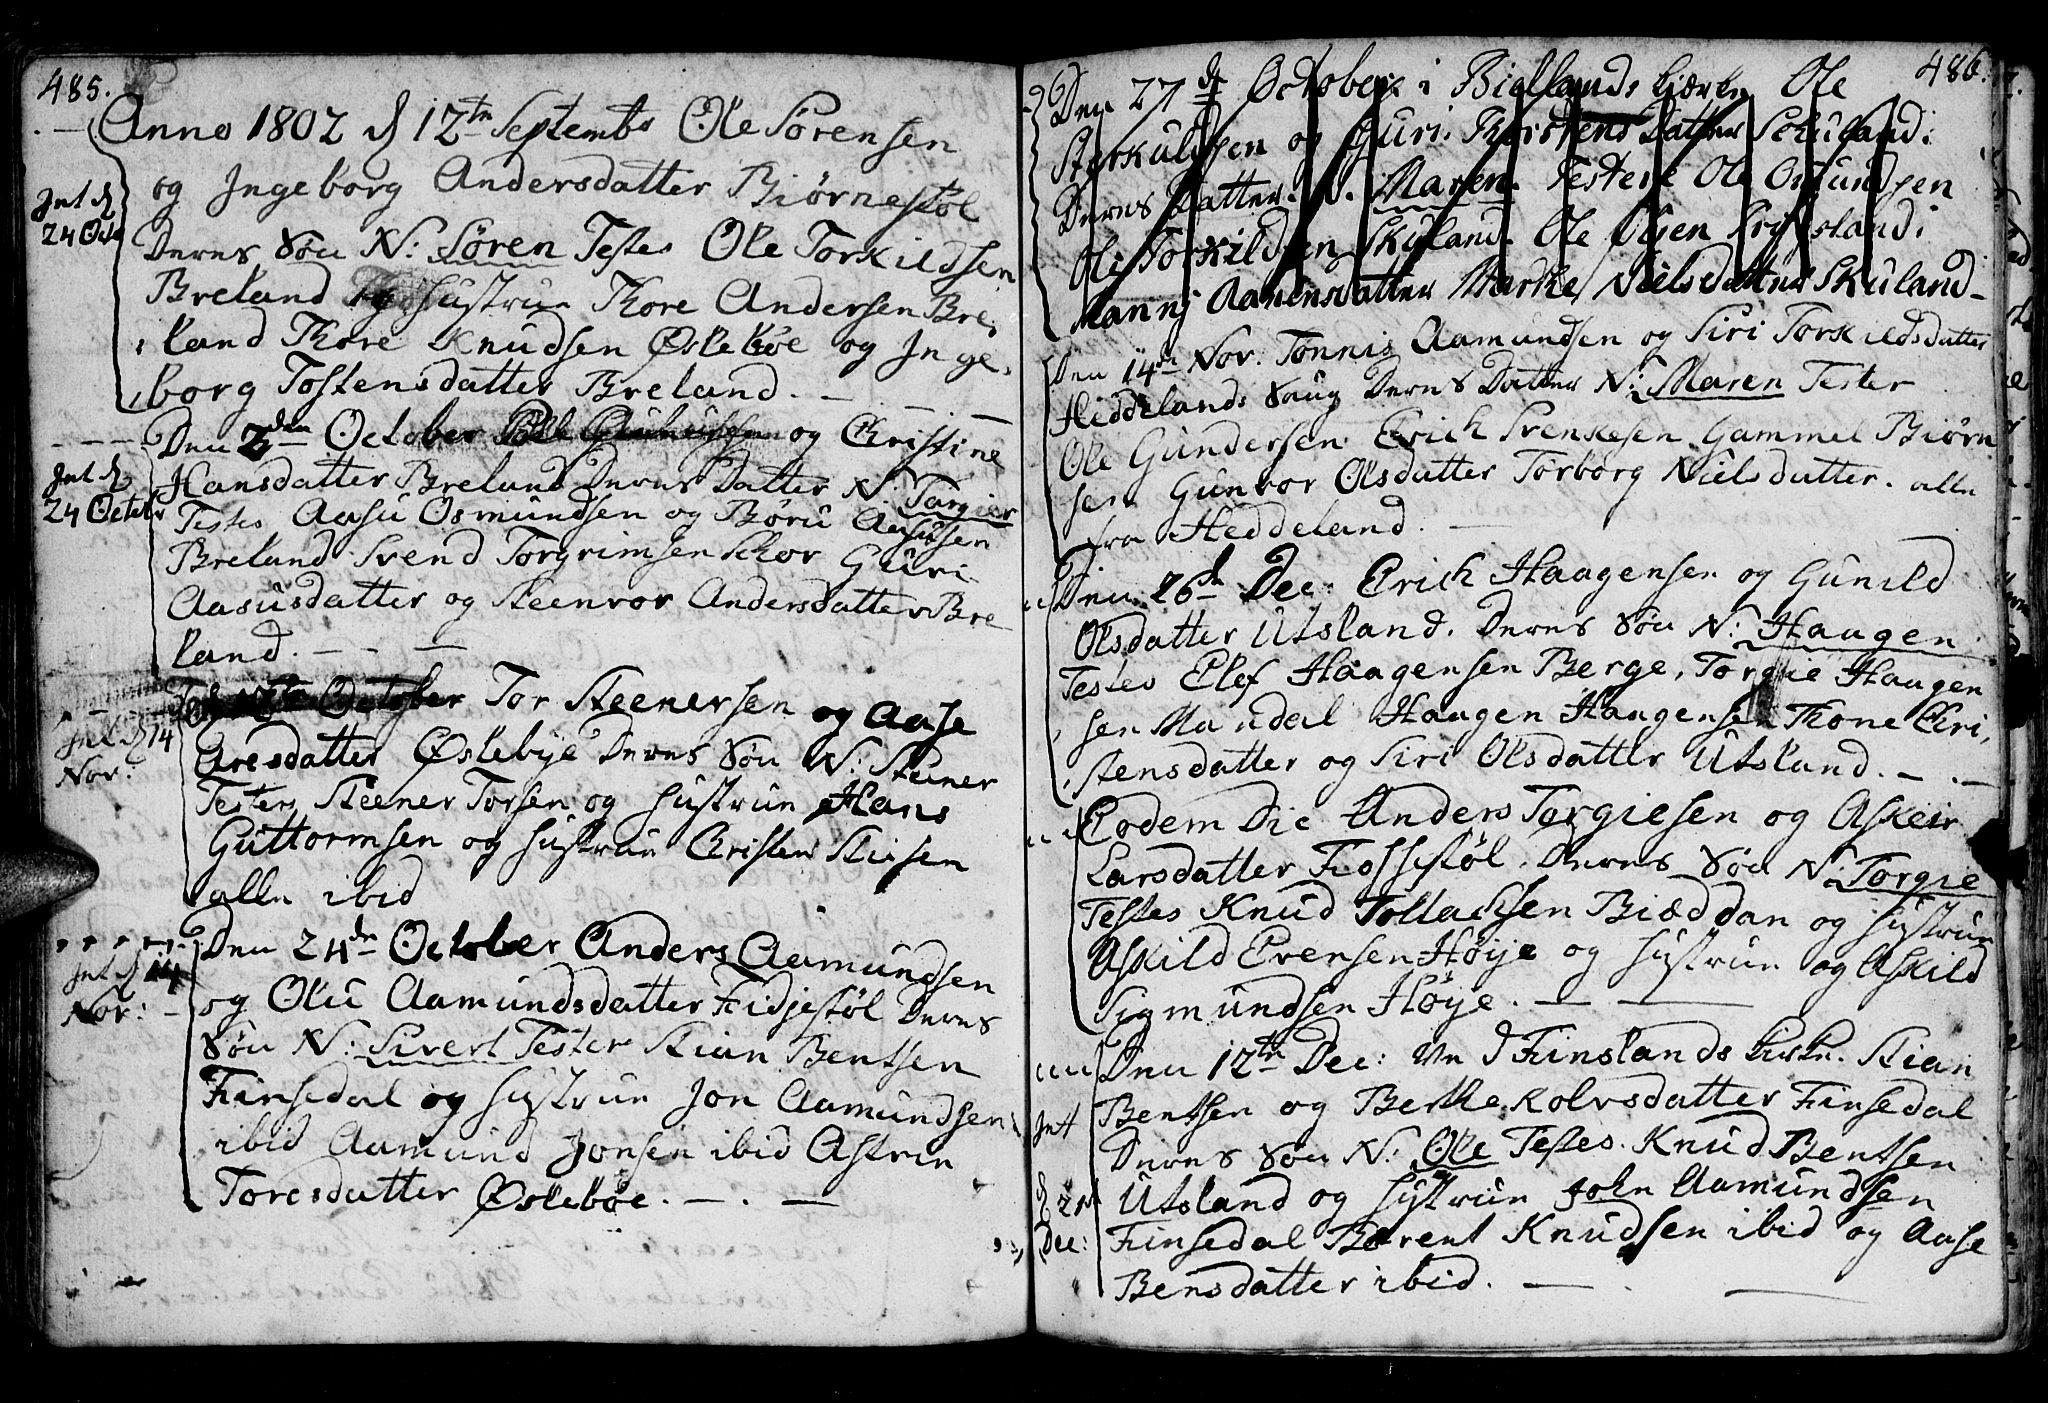 SAK, Holum sokneprestkontor, F/Fa/Fac/L0001: Ministerialbok nr. A 1, 1773-1820, s. 485-486